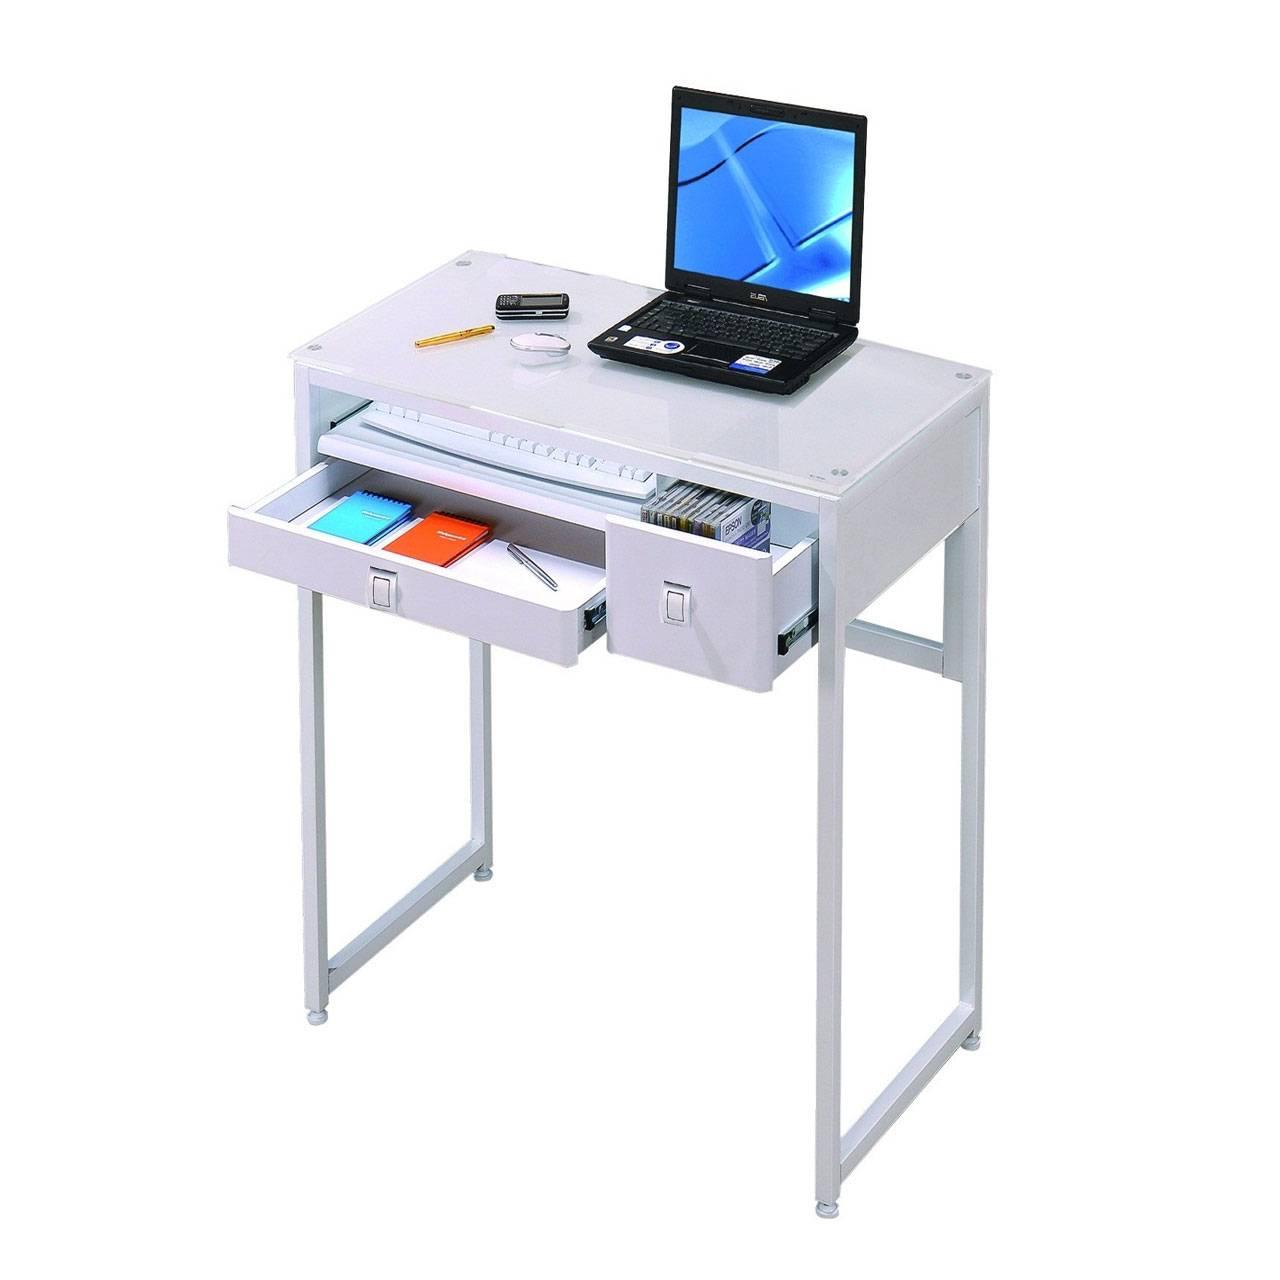 Carl Computer Desk Furniture Store Manila Philippines  : CH 228L WH from www.urbanconcepts.ph size 1280 x 1280 jpeg 58kB